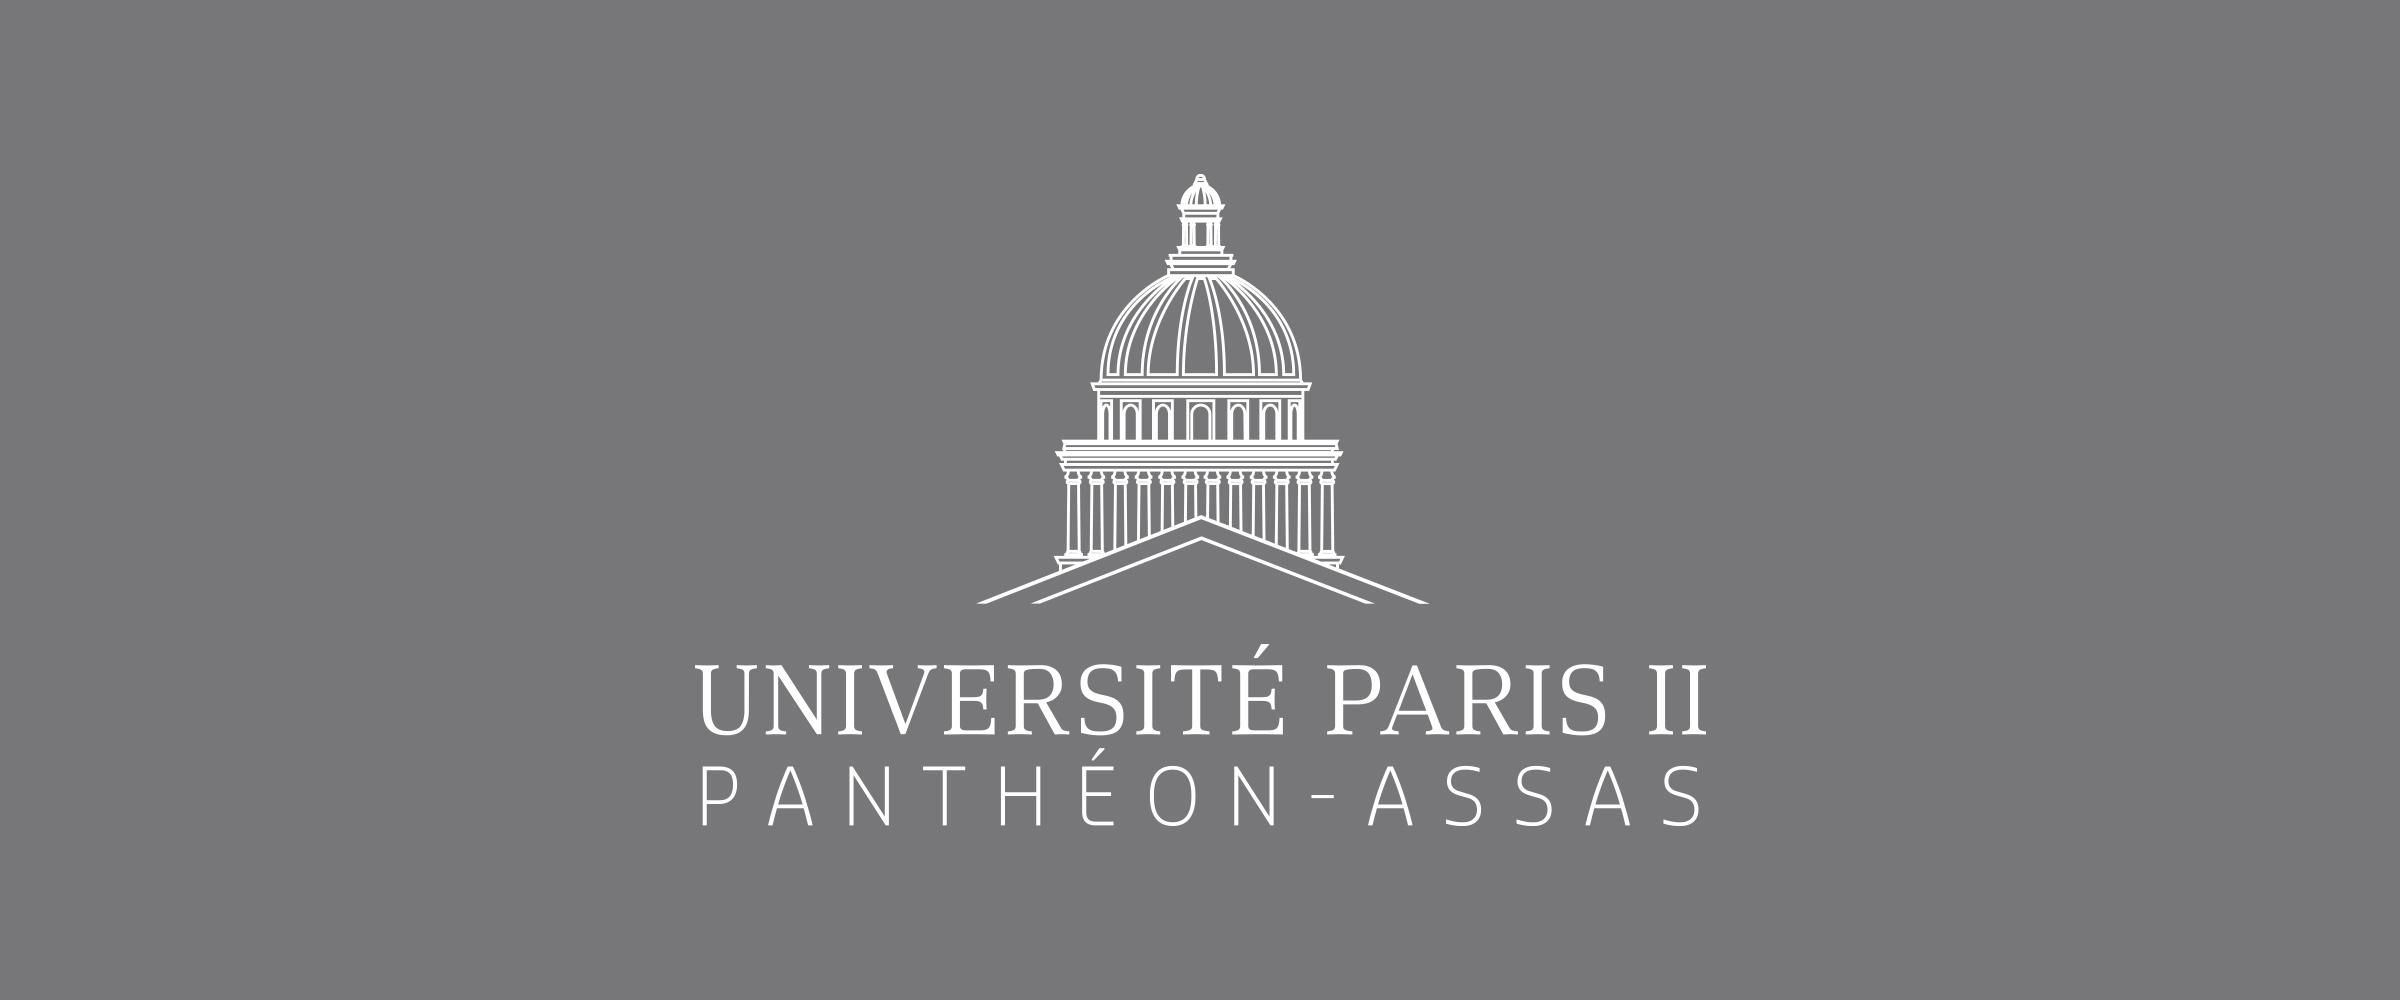 Logotype Université Panthéon Assas